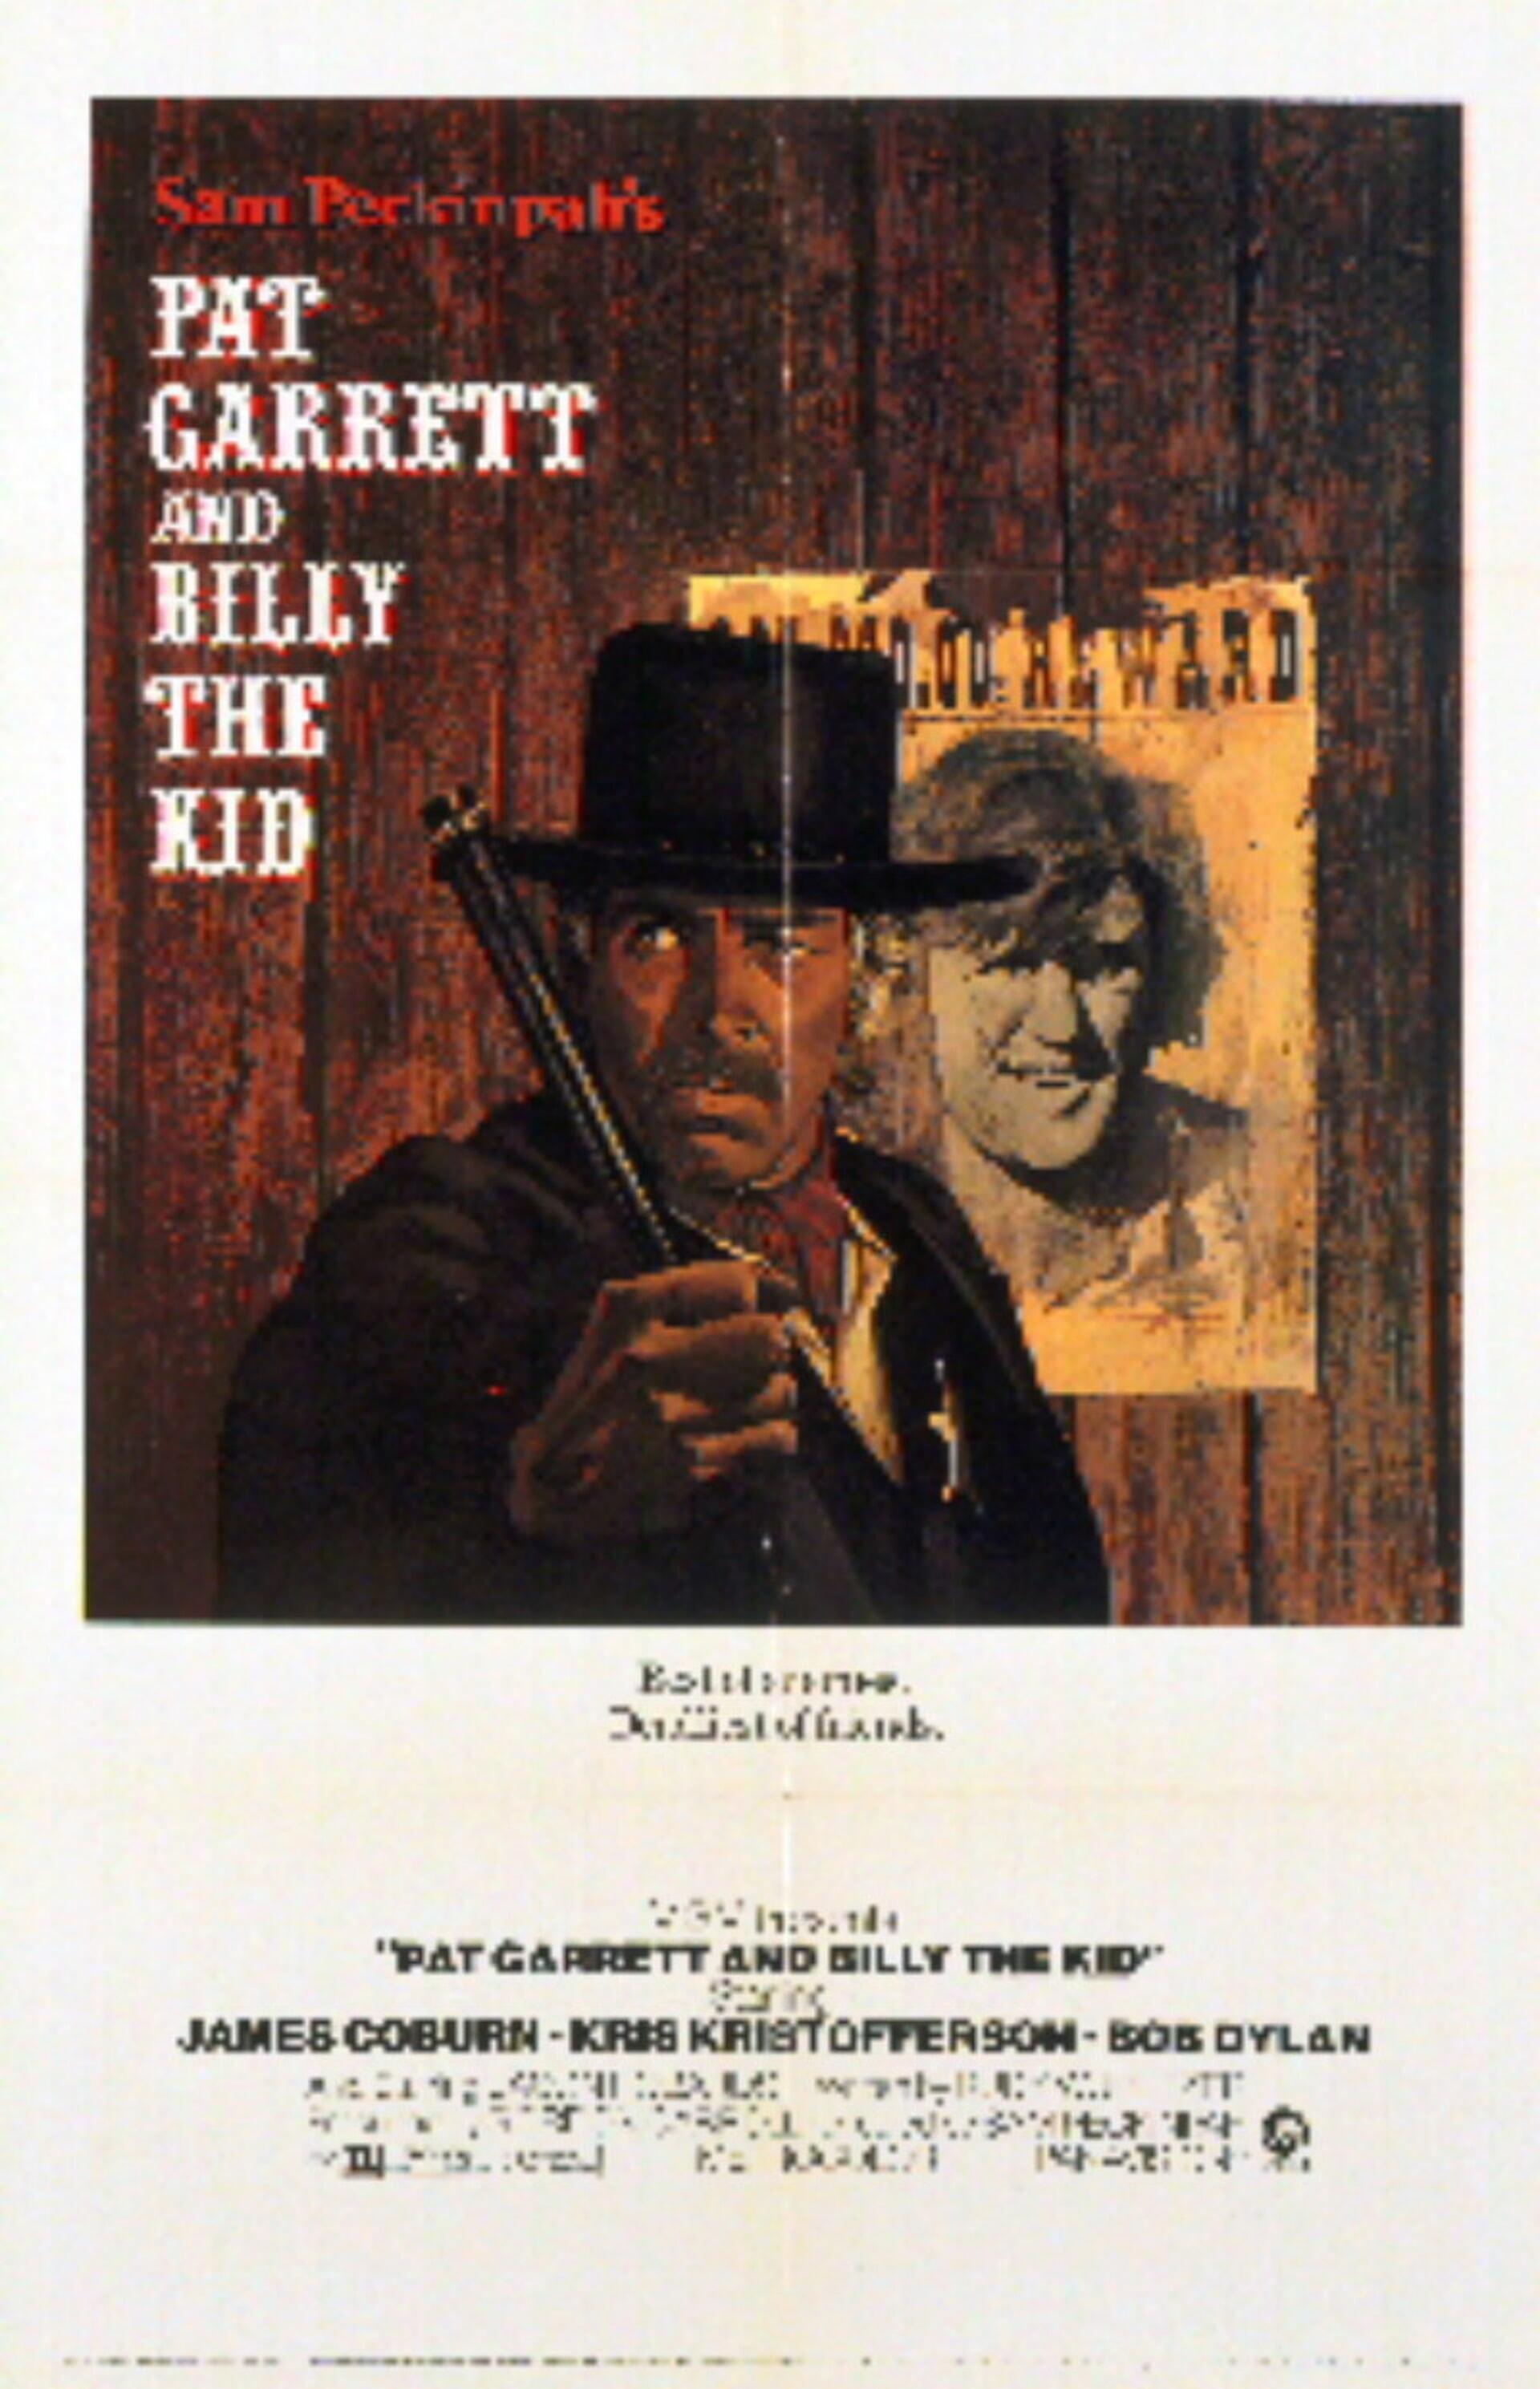 Pat Garrett & Billy the Kid - Poster 2